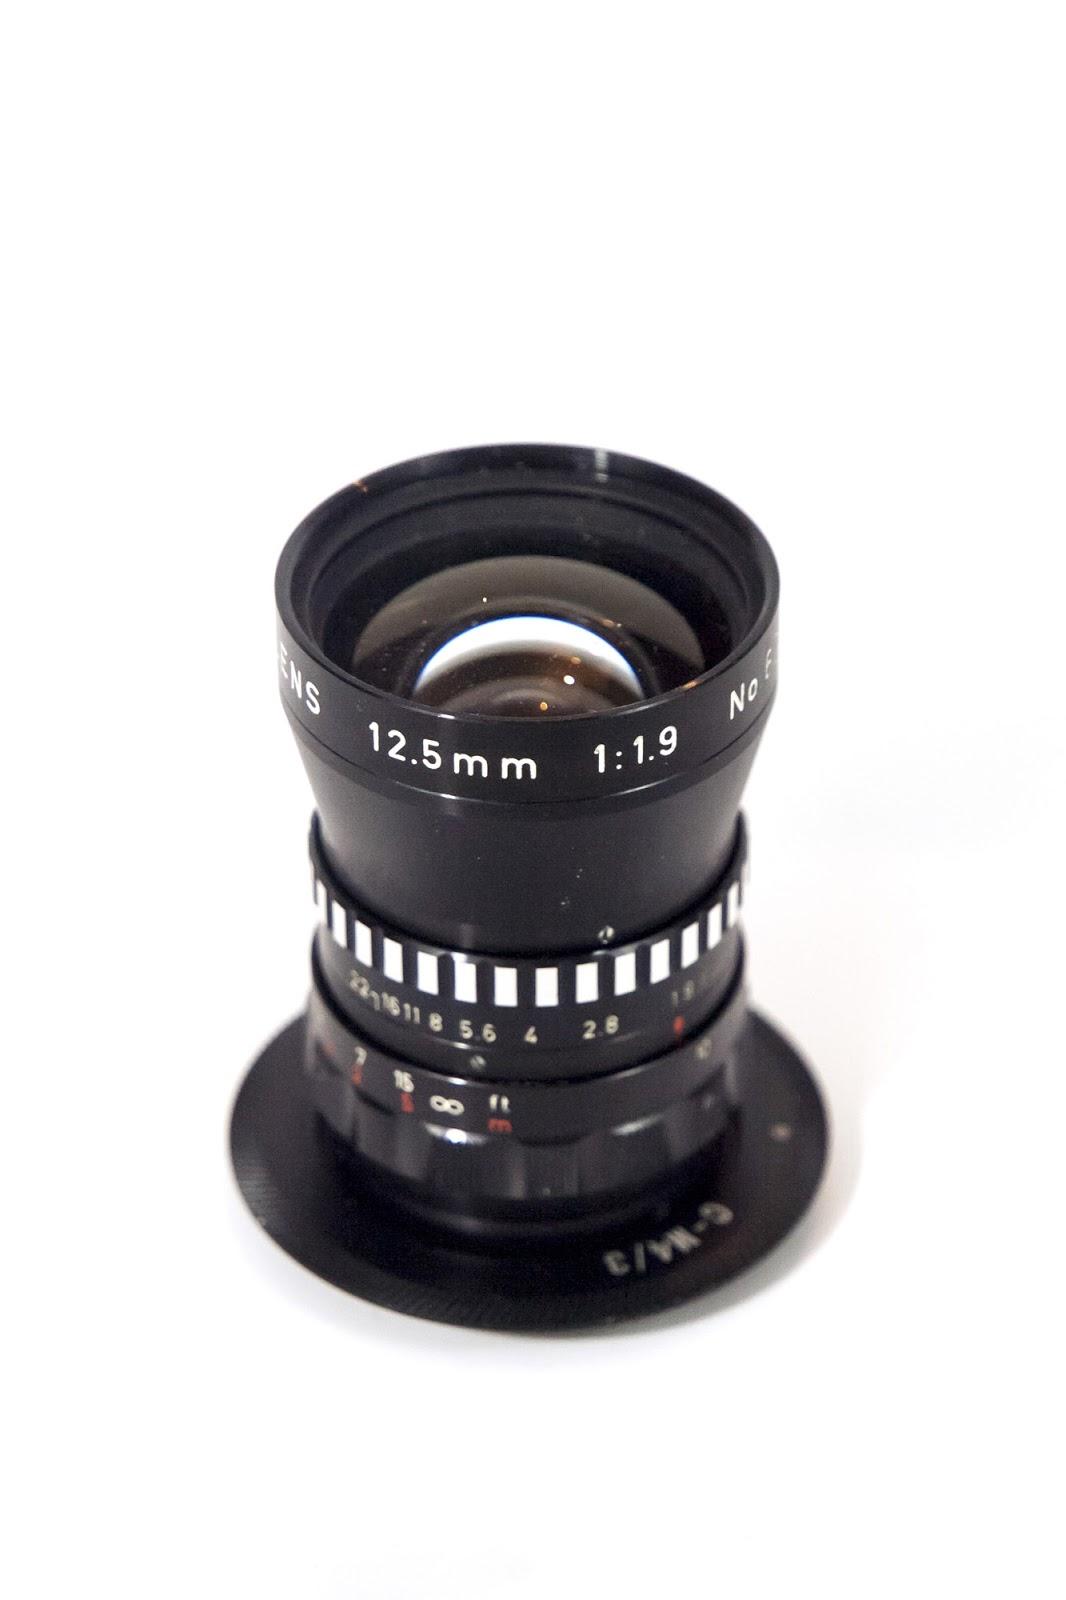 Cosmicar 12.5/1.9 (12.5 mm f1.9)